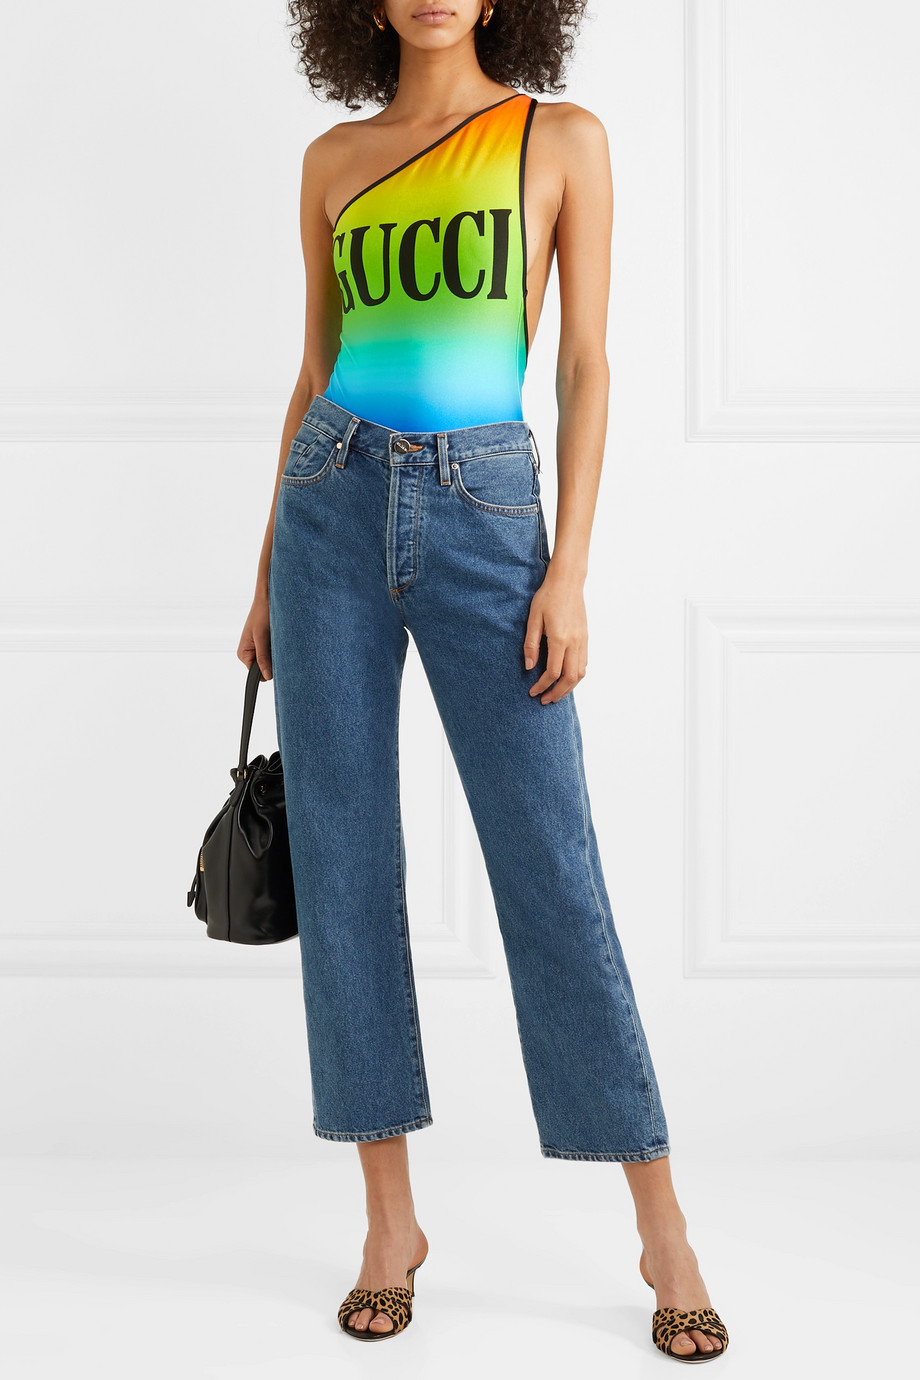 Gucci One-shoulder printed stretch bodysuit